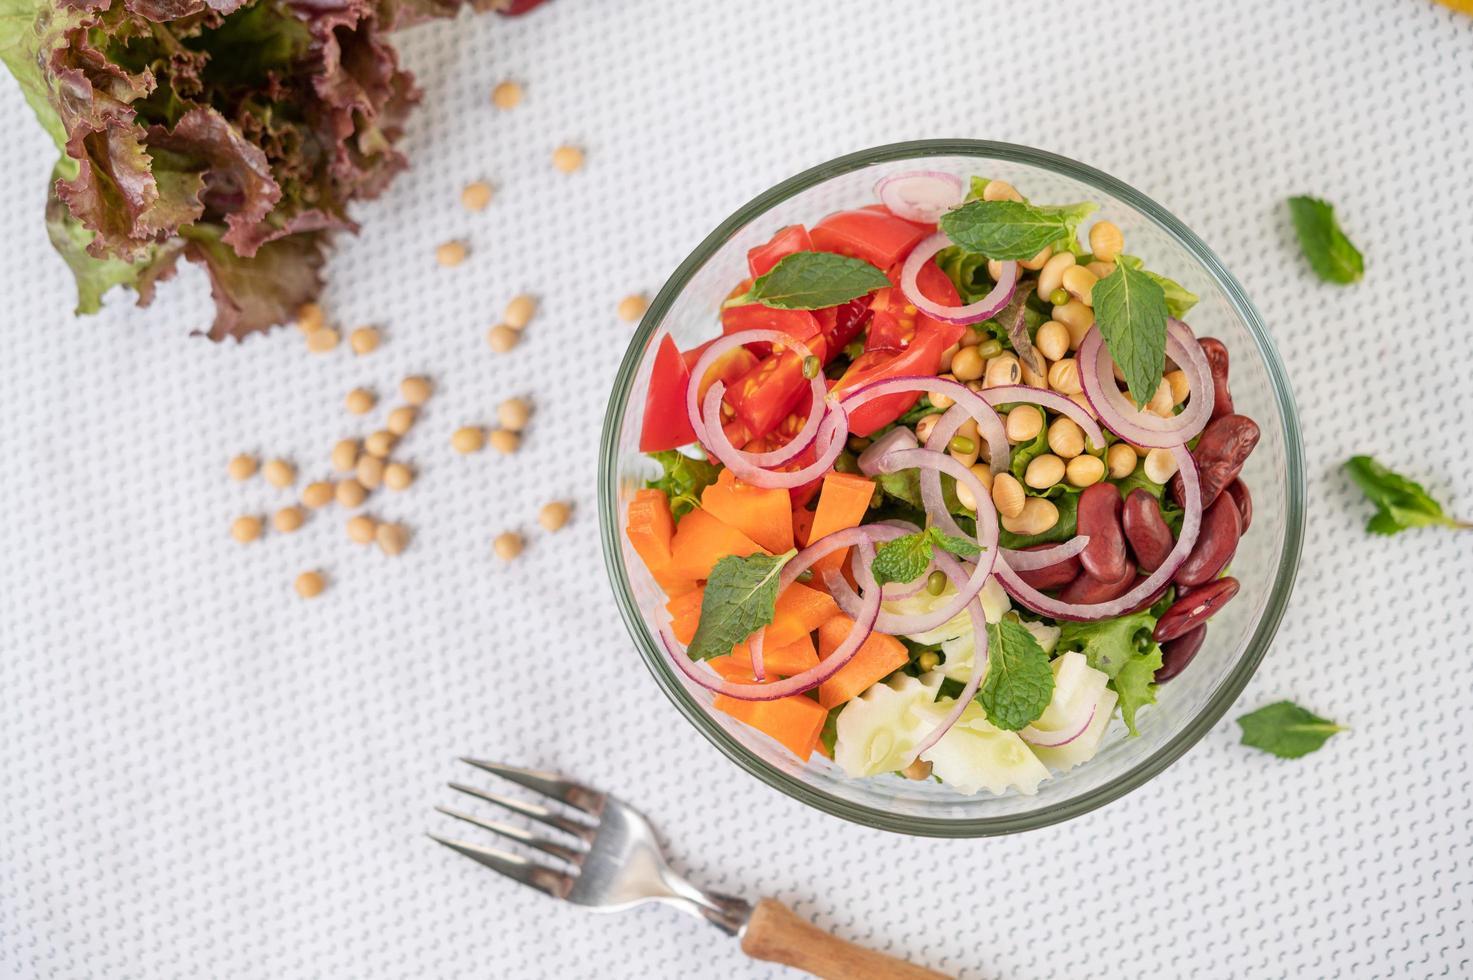 verse groente- en fruitsalade in een glazen kom foto